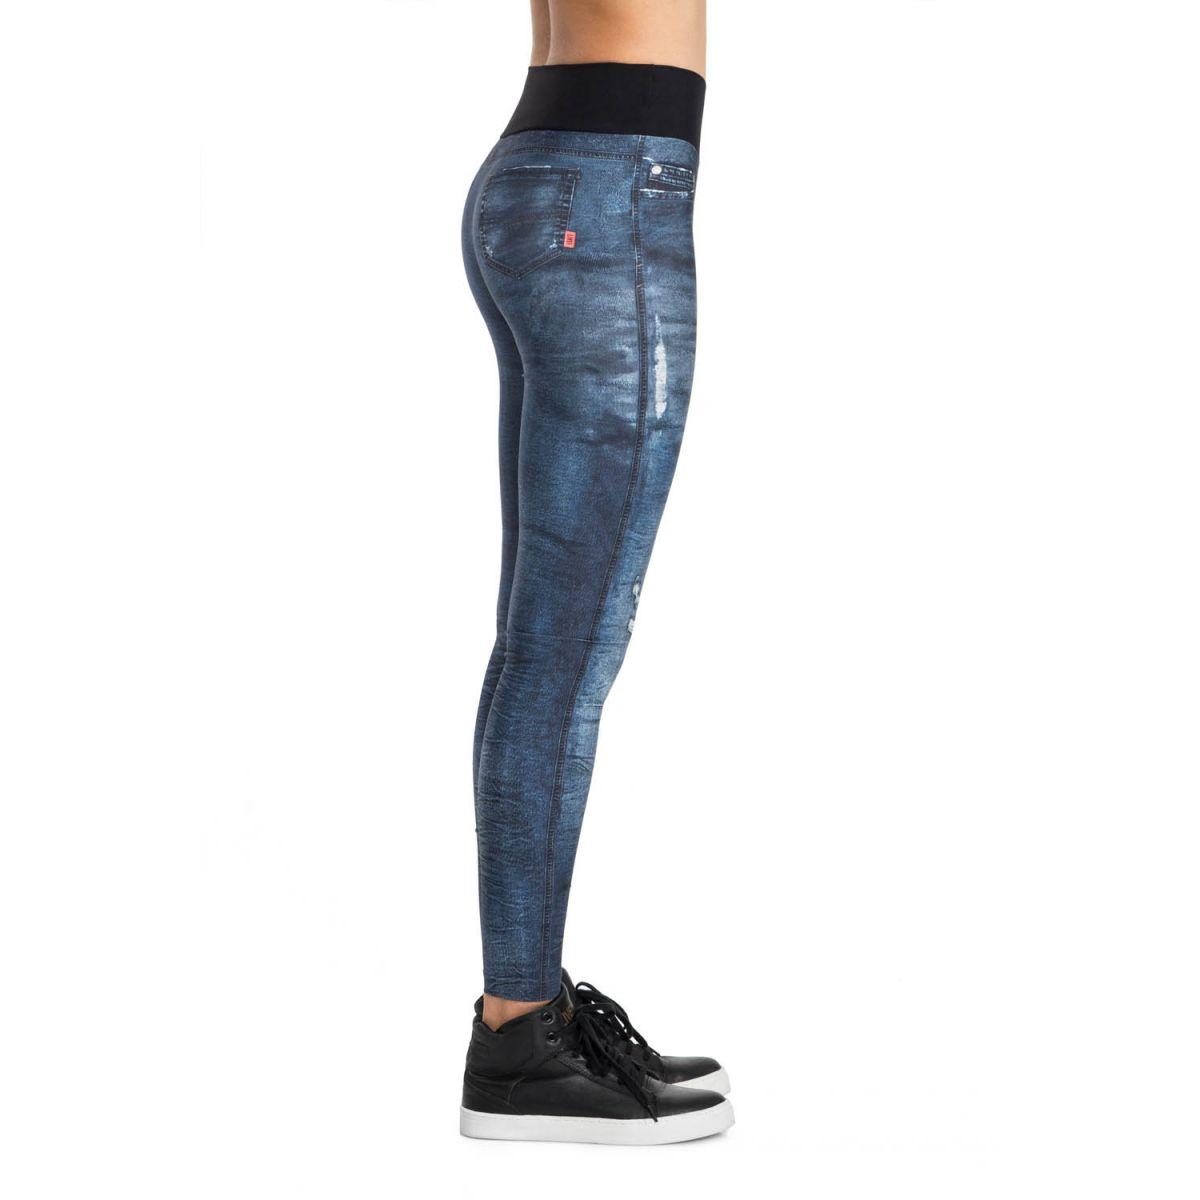 Fusô Jeans Power Riff Urban Live